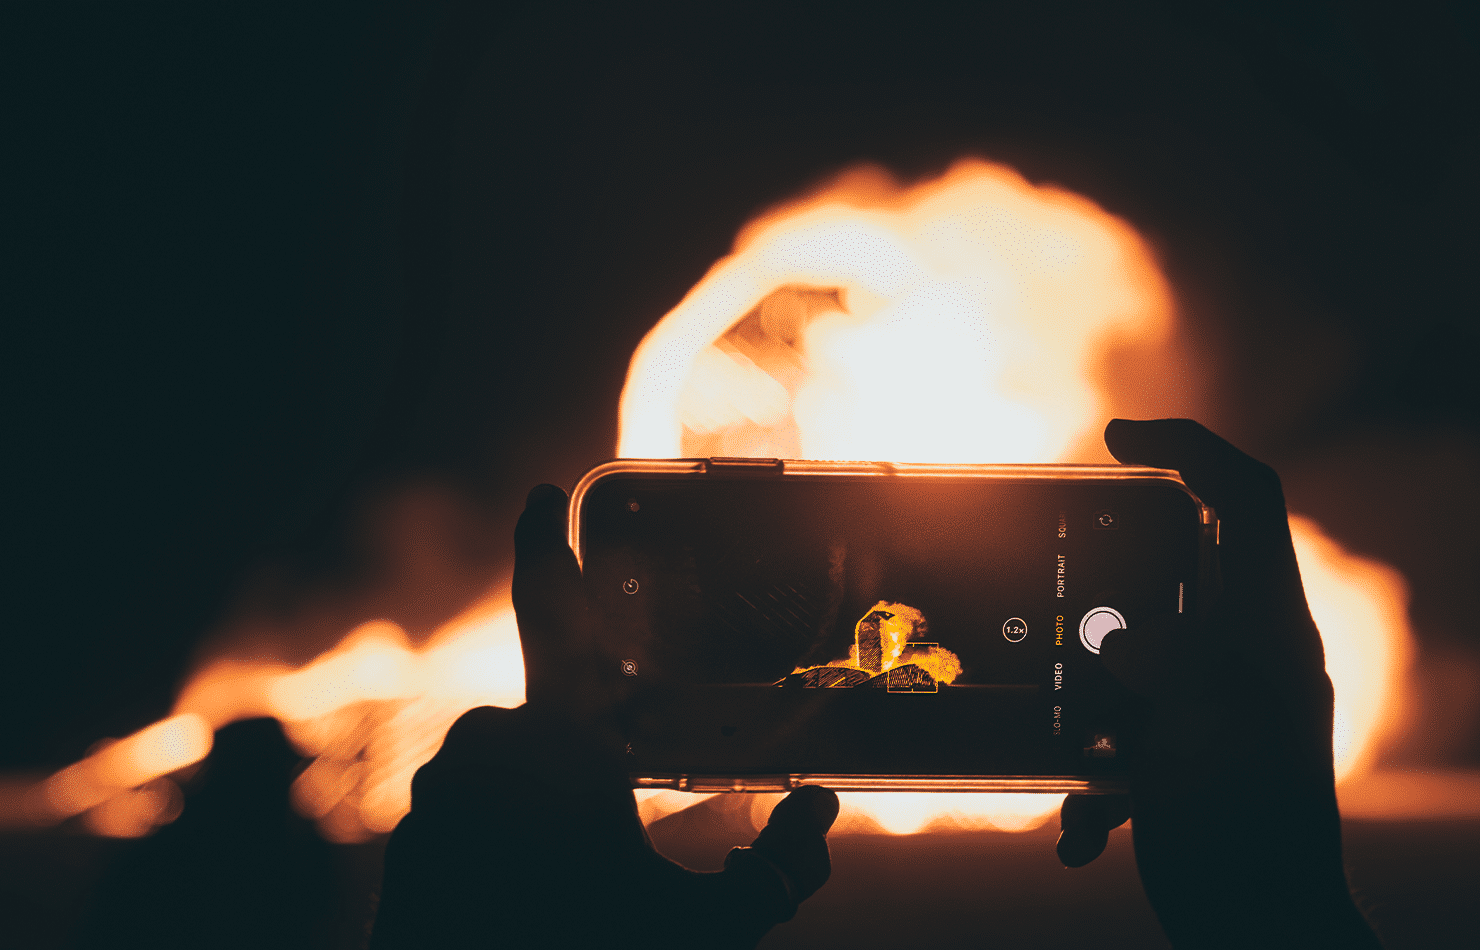 Bonfire, iPhone, Sync